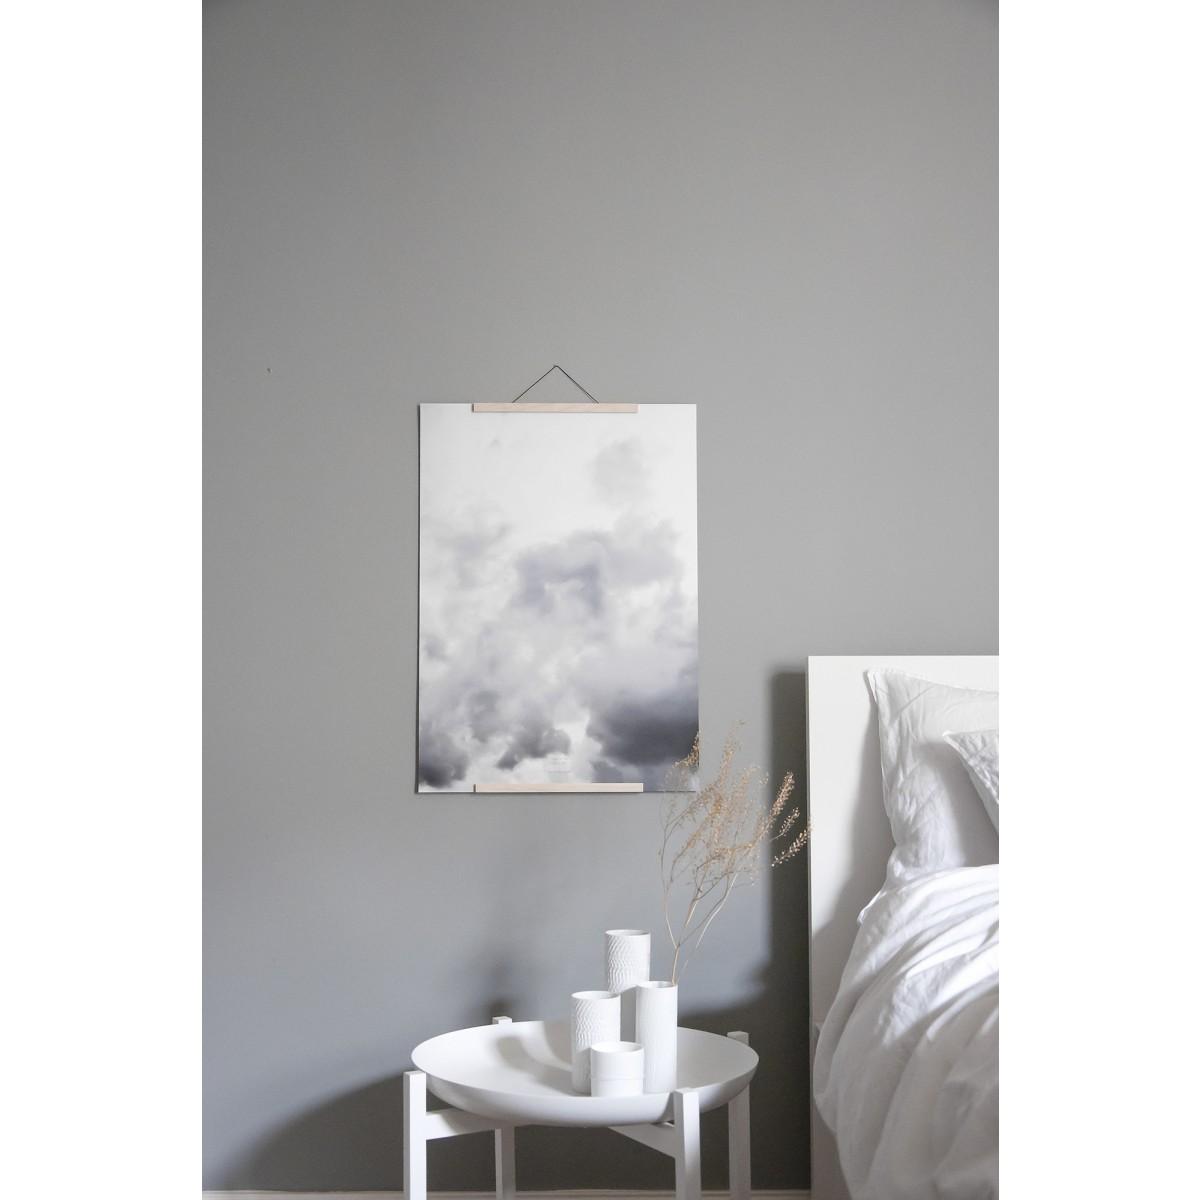 na.hili head in the clouds - A3 Artprint - Poster